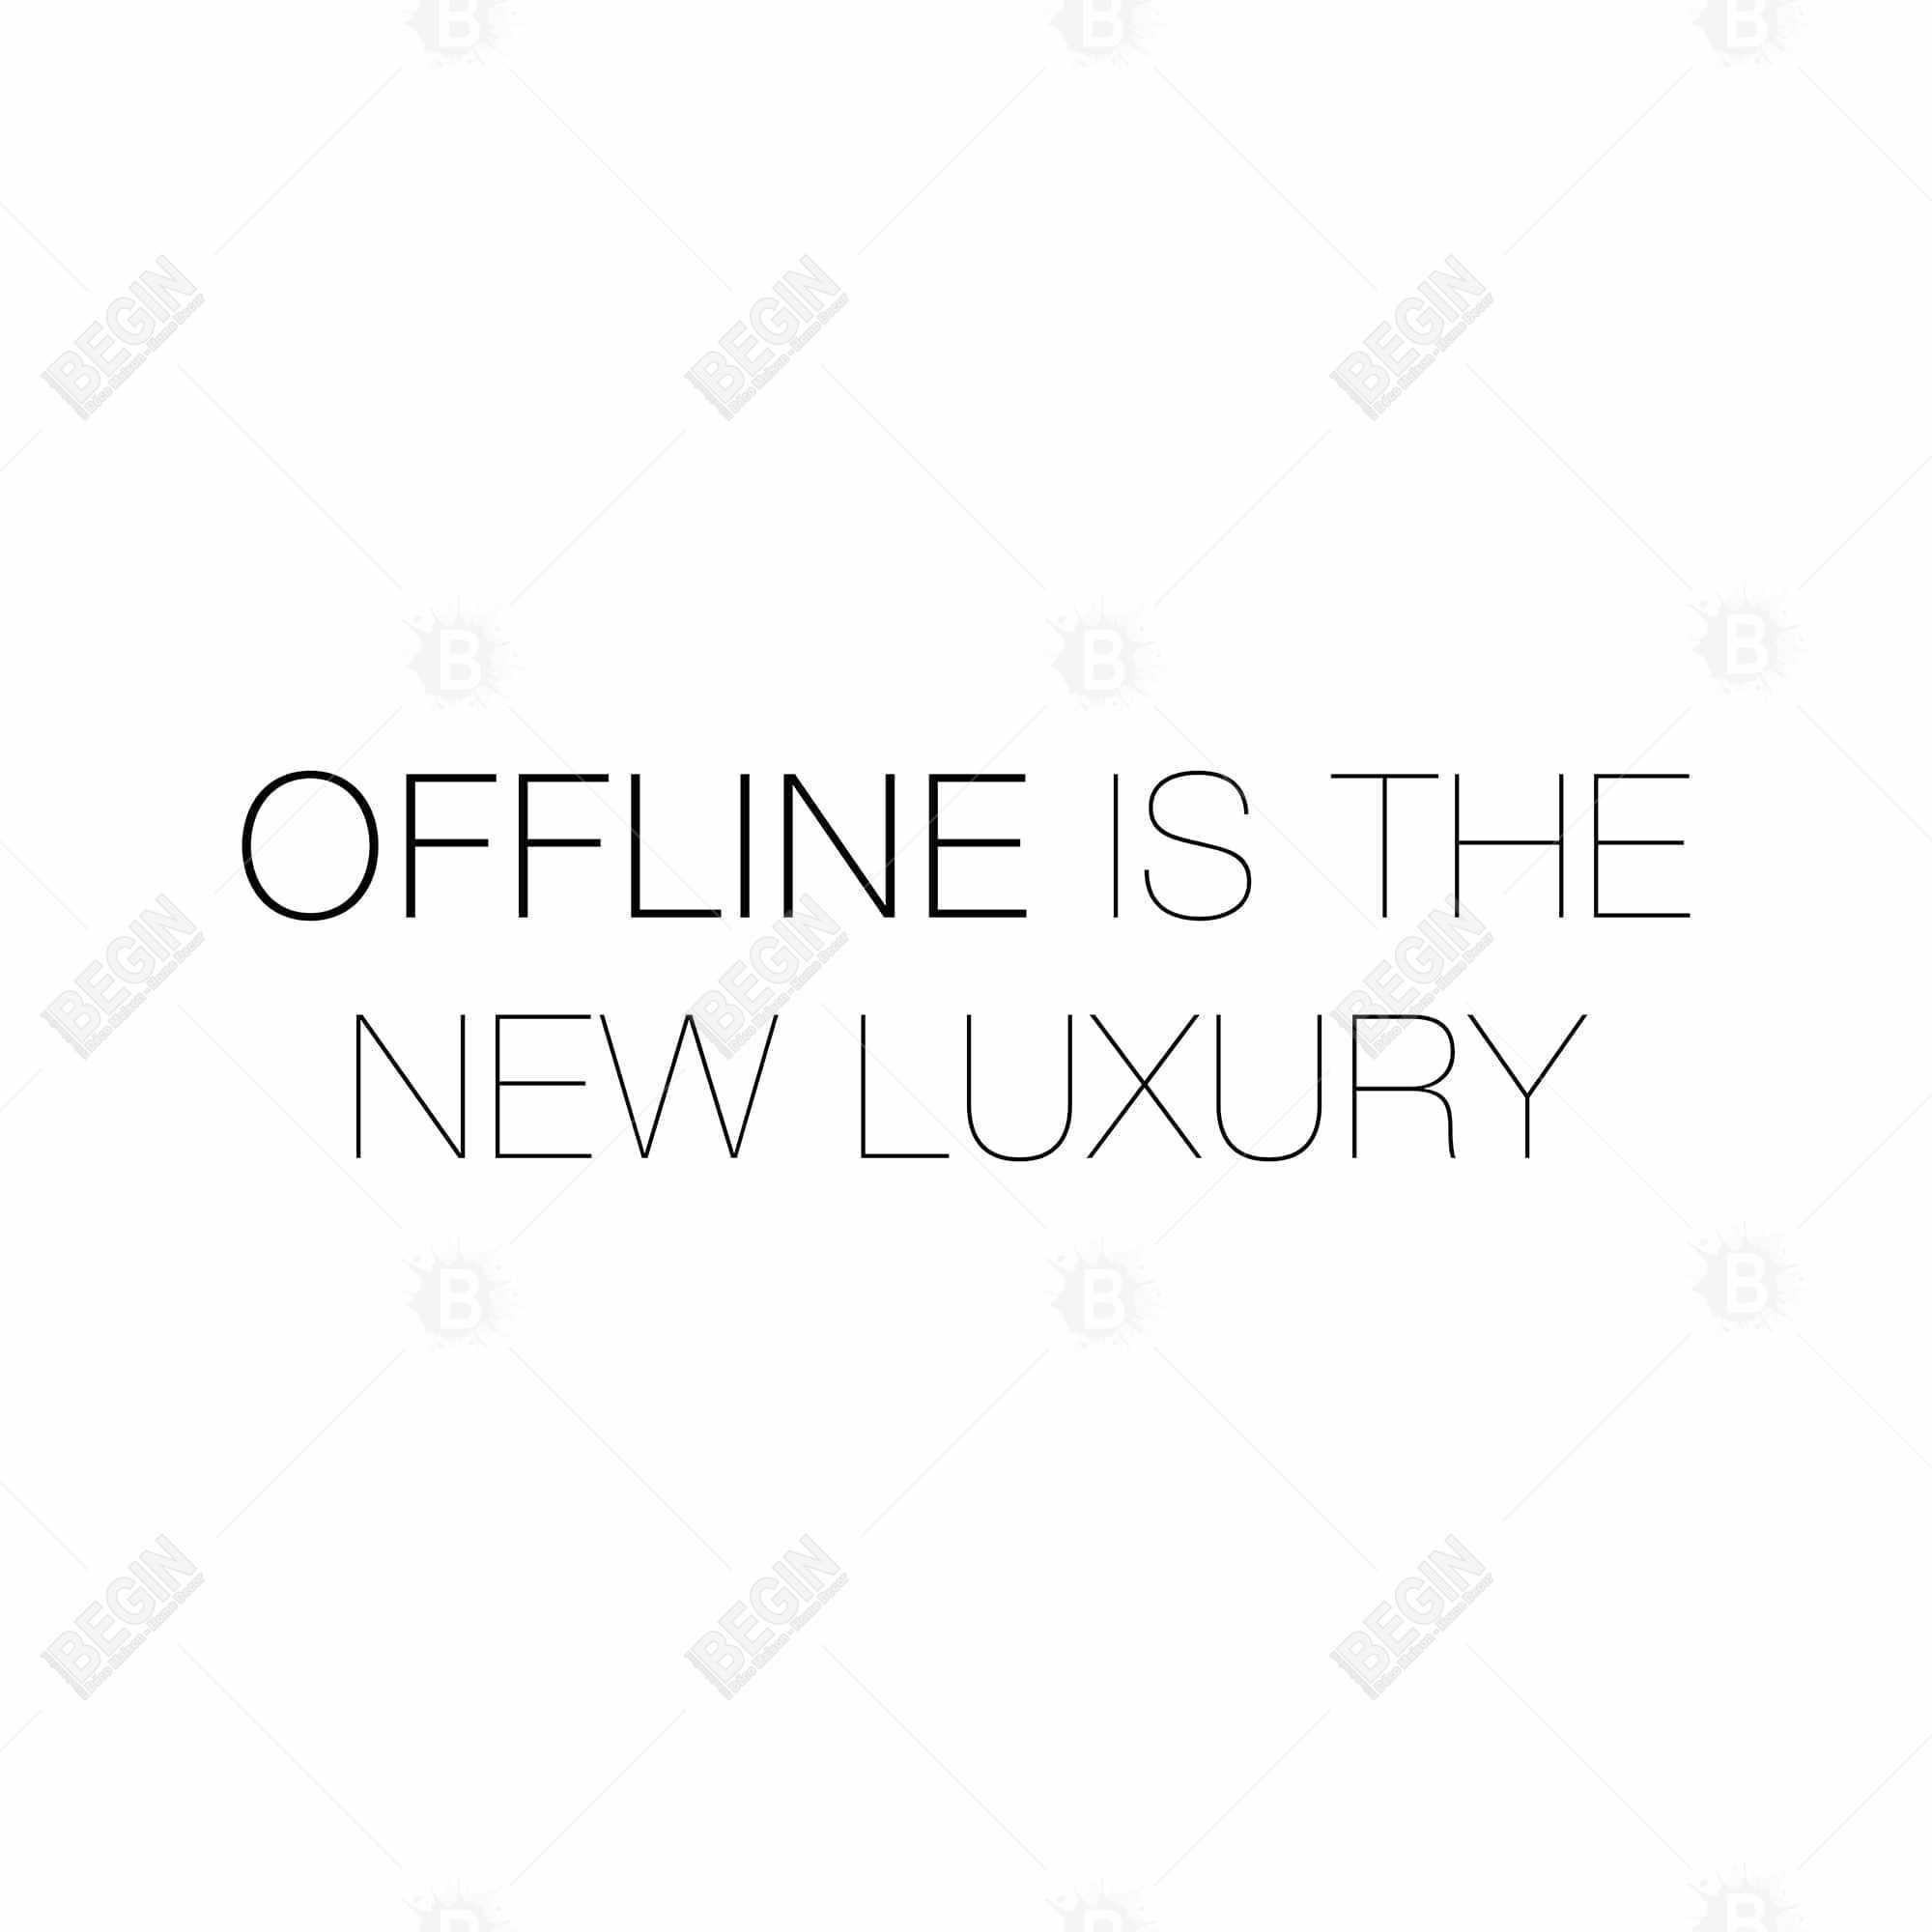 Offline is the new luxury